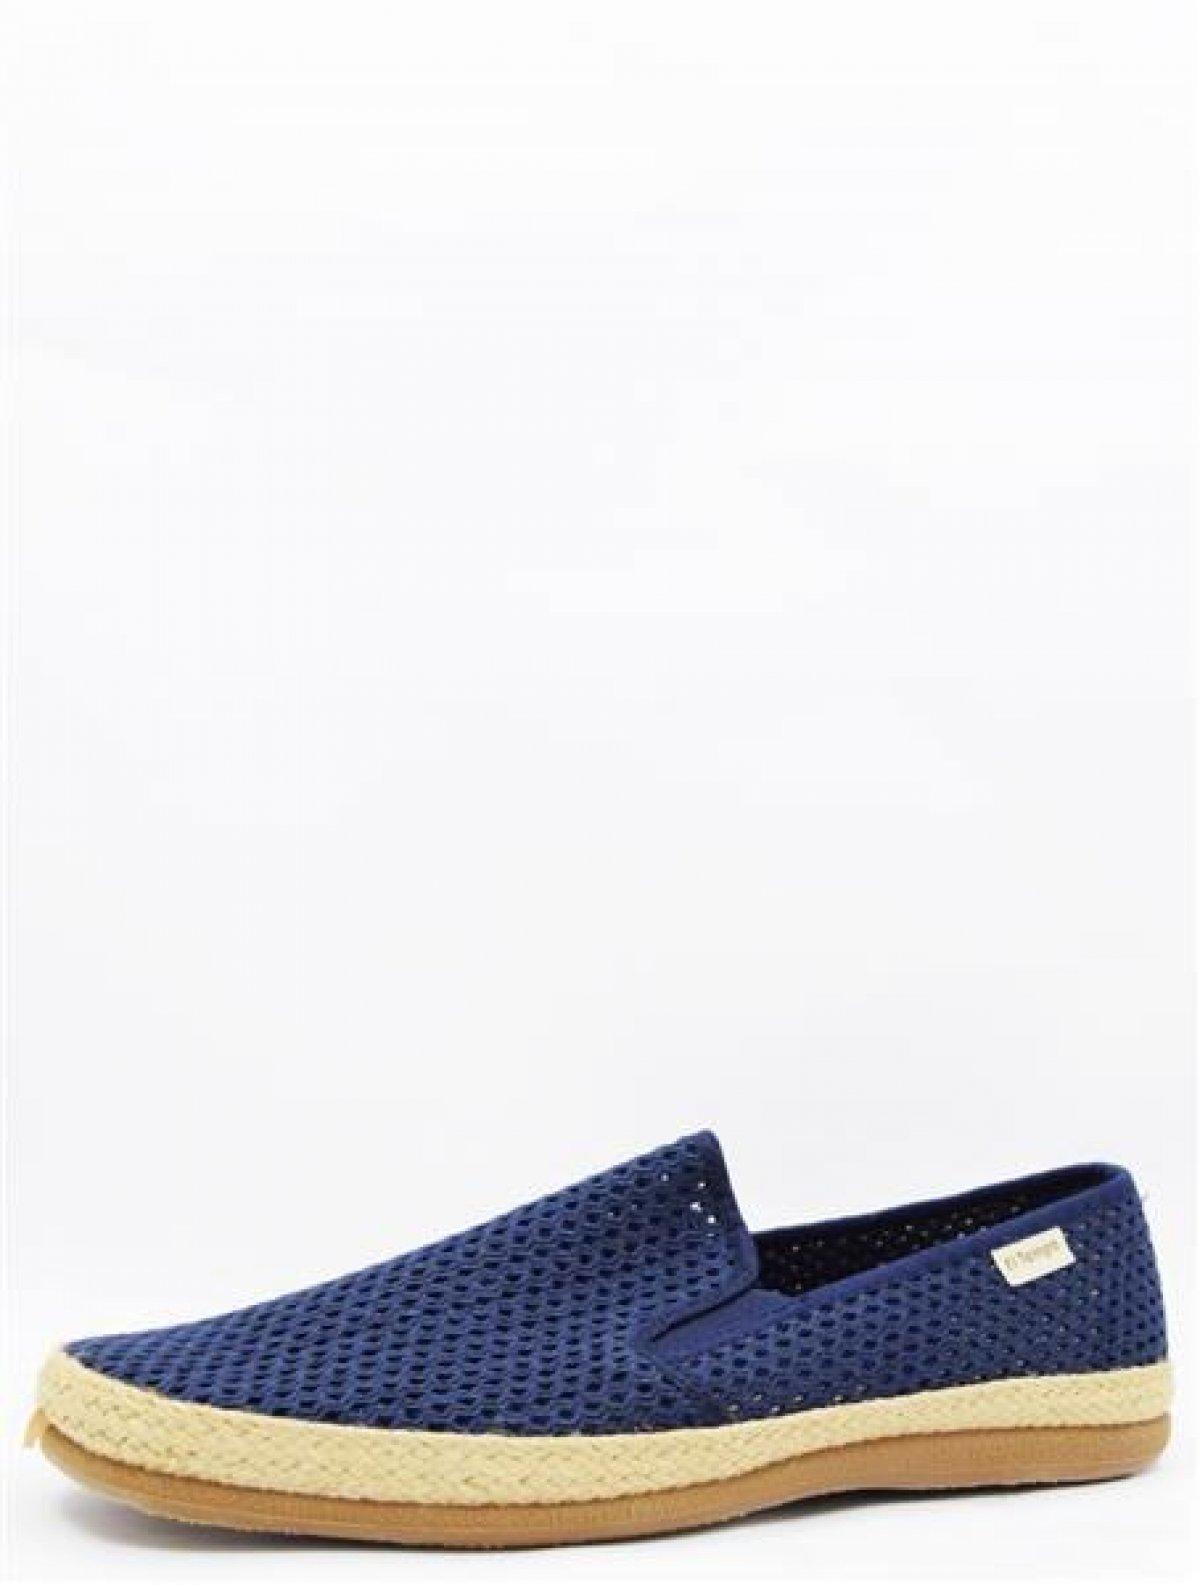 ER8-552 мужские туфли